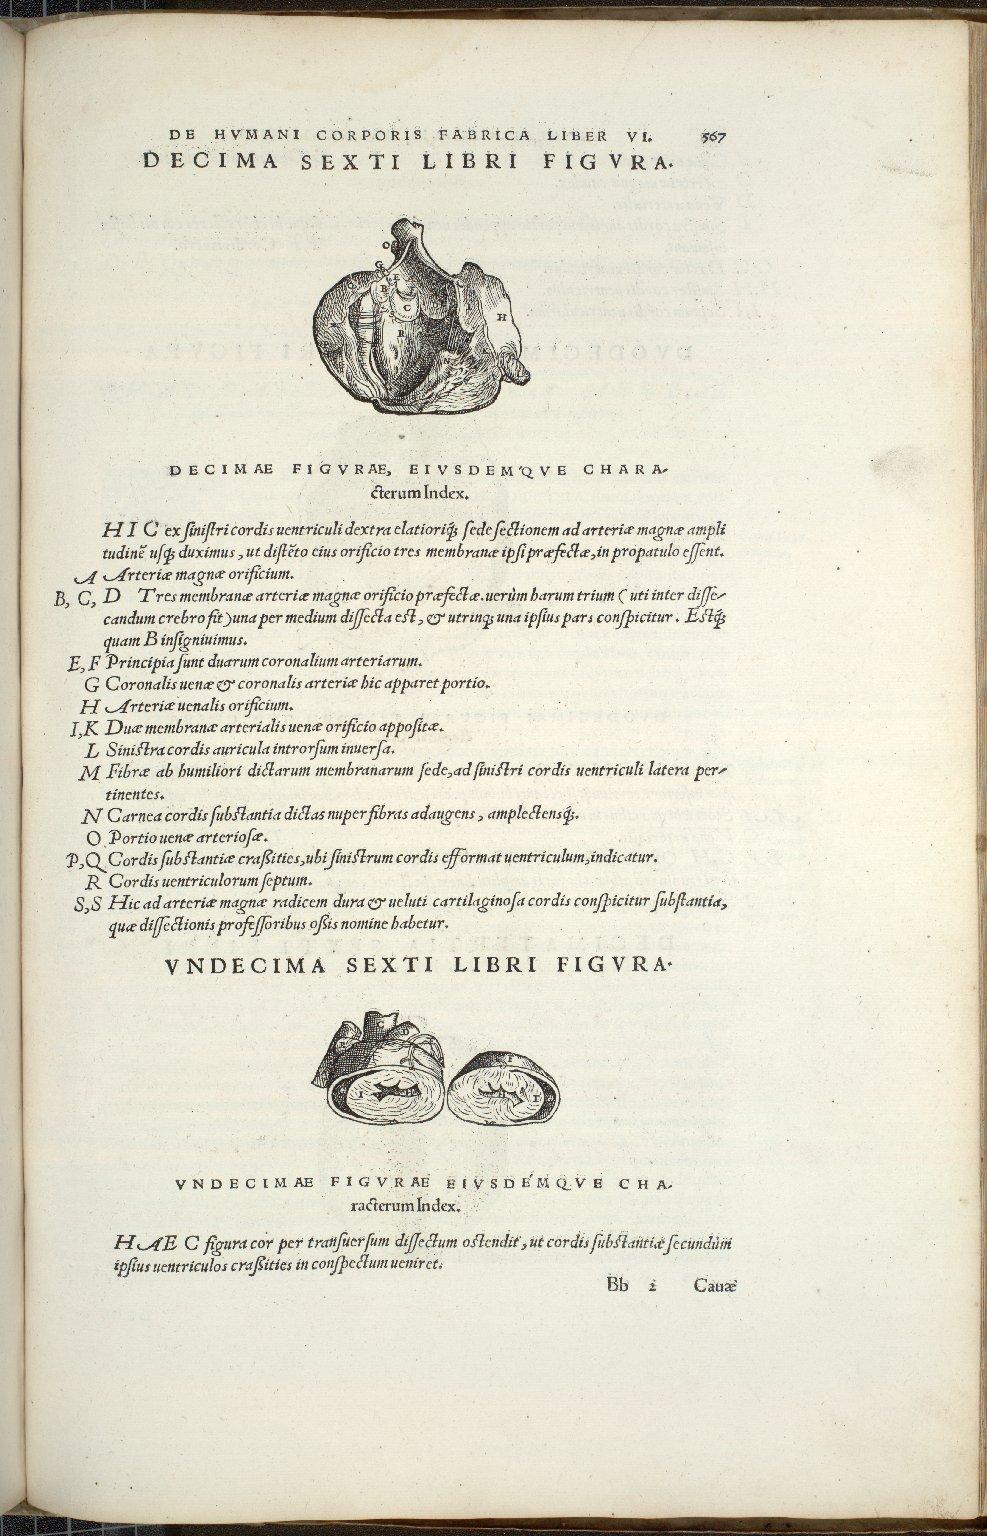 Decima Sexti Libri Figura, Undecima Sexti Libri Figura.